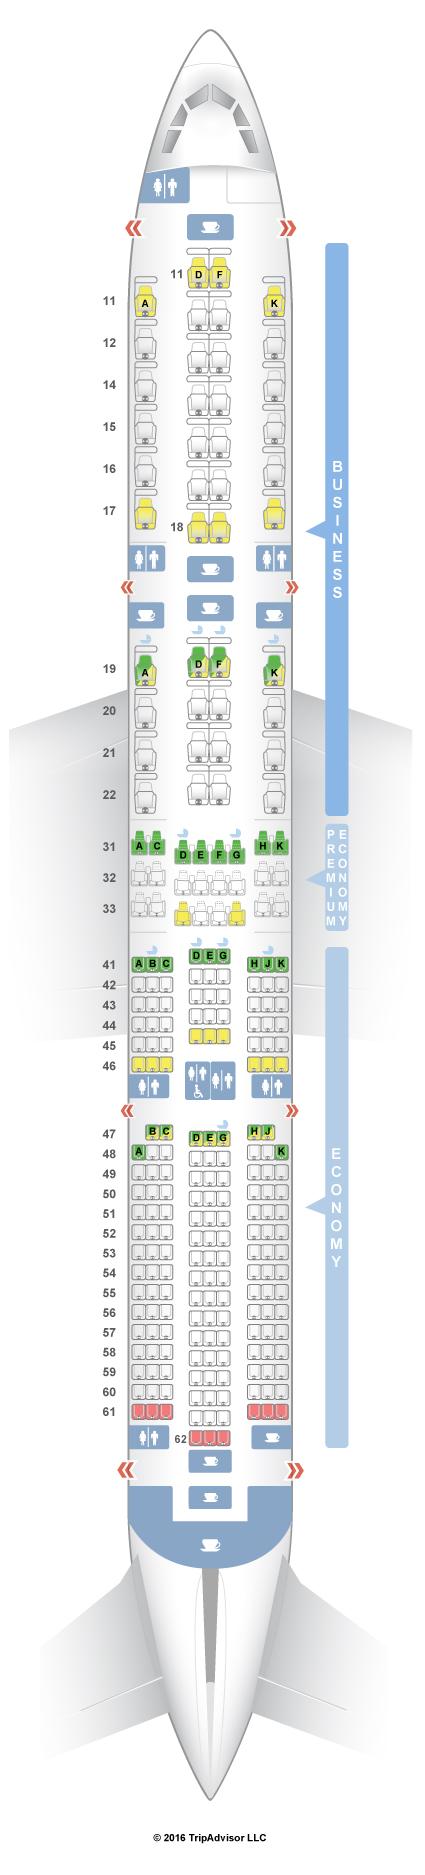 Seatguru Seat Map Singapore Airlines Airbus A350 900 359